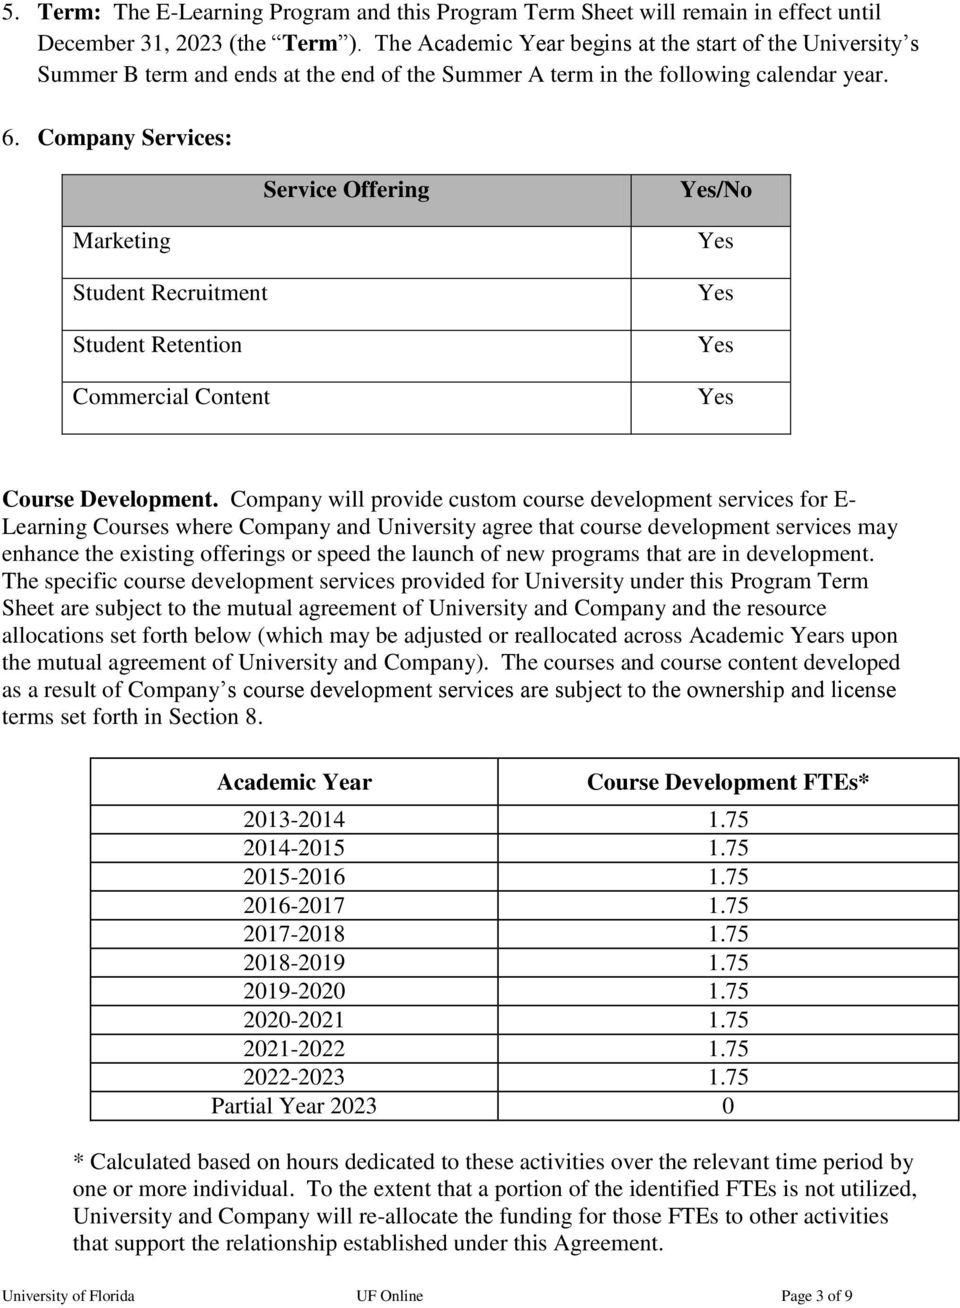 Exhibit A 7. Program Term Sheet - Pdf Free Download Regarding Texas Tech University Academic Calendar 2021 2021